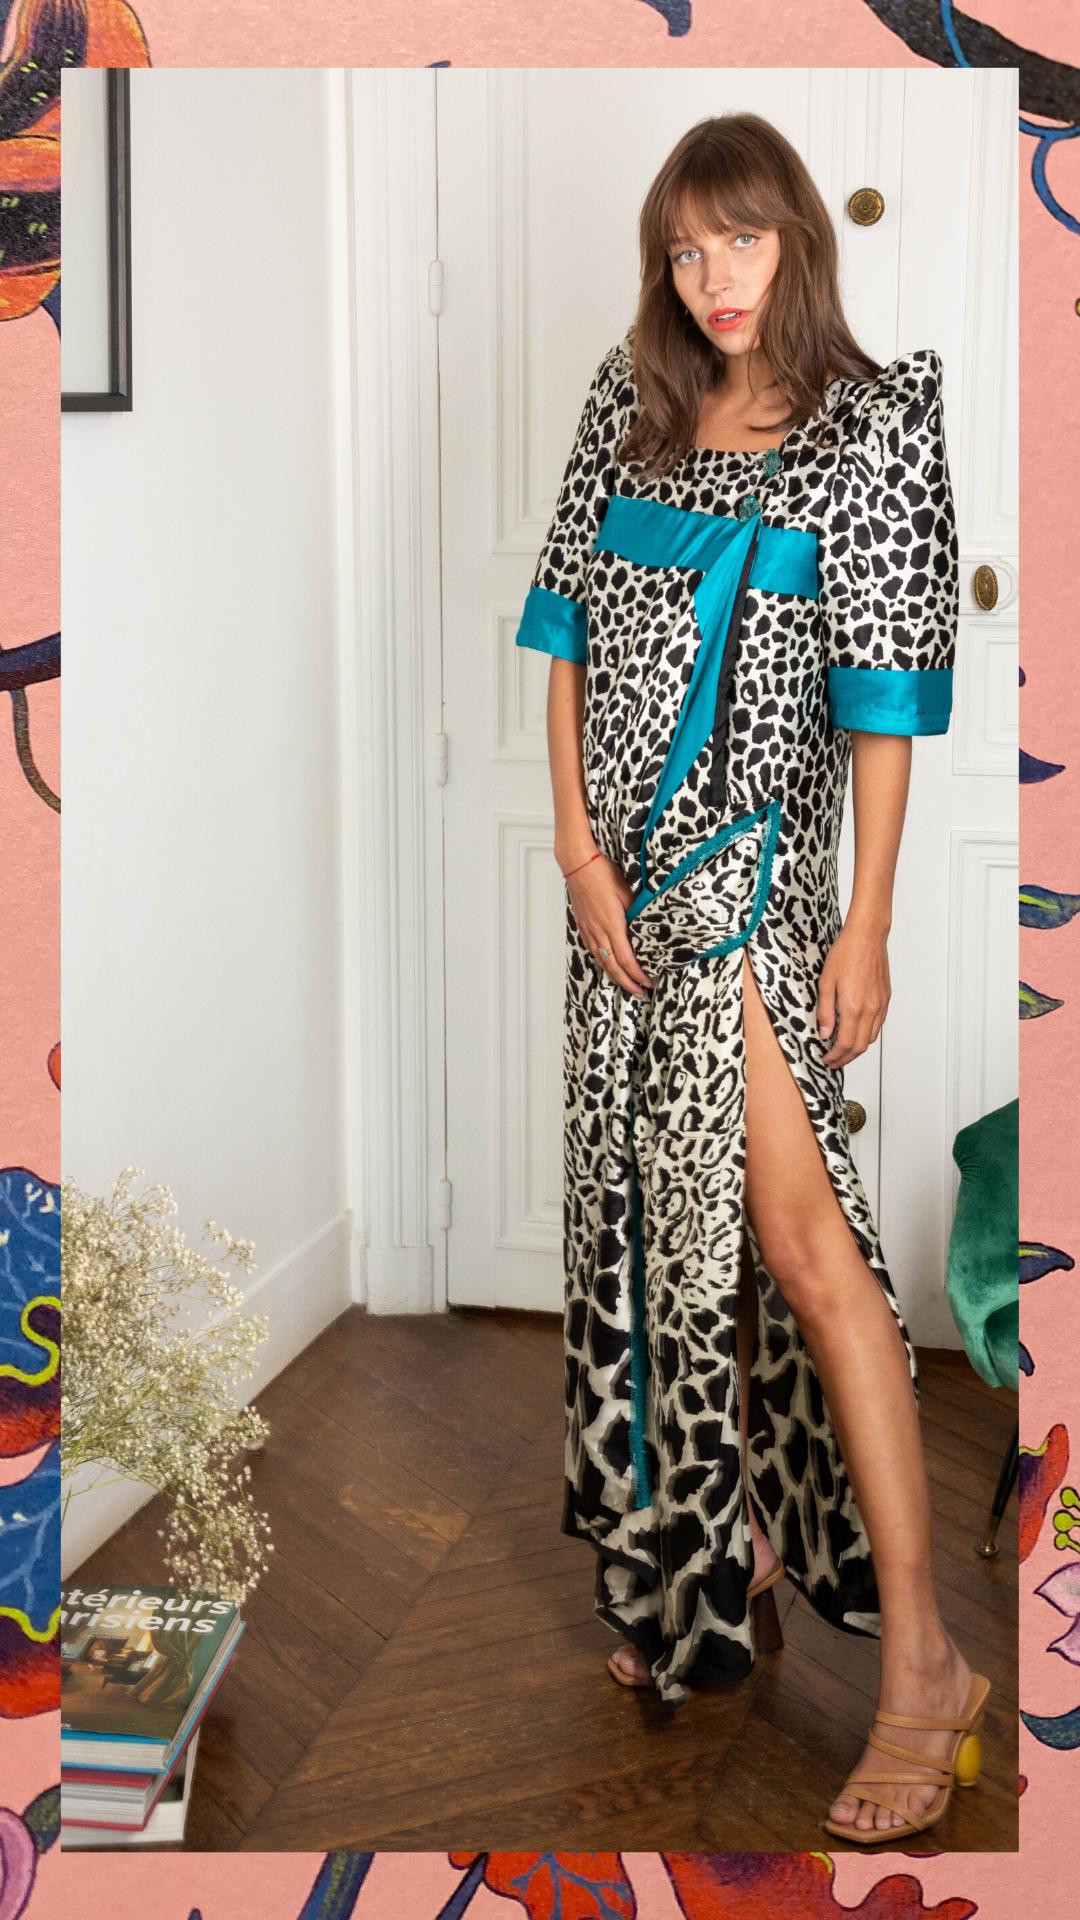 Perla Dress - 450€